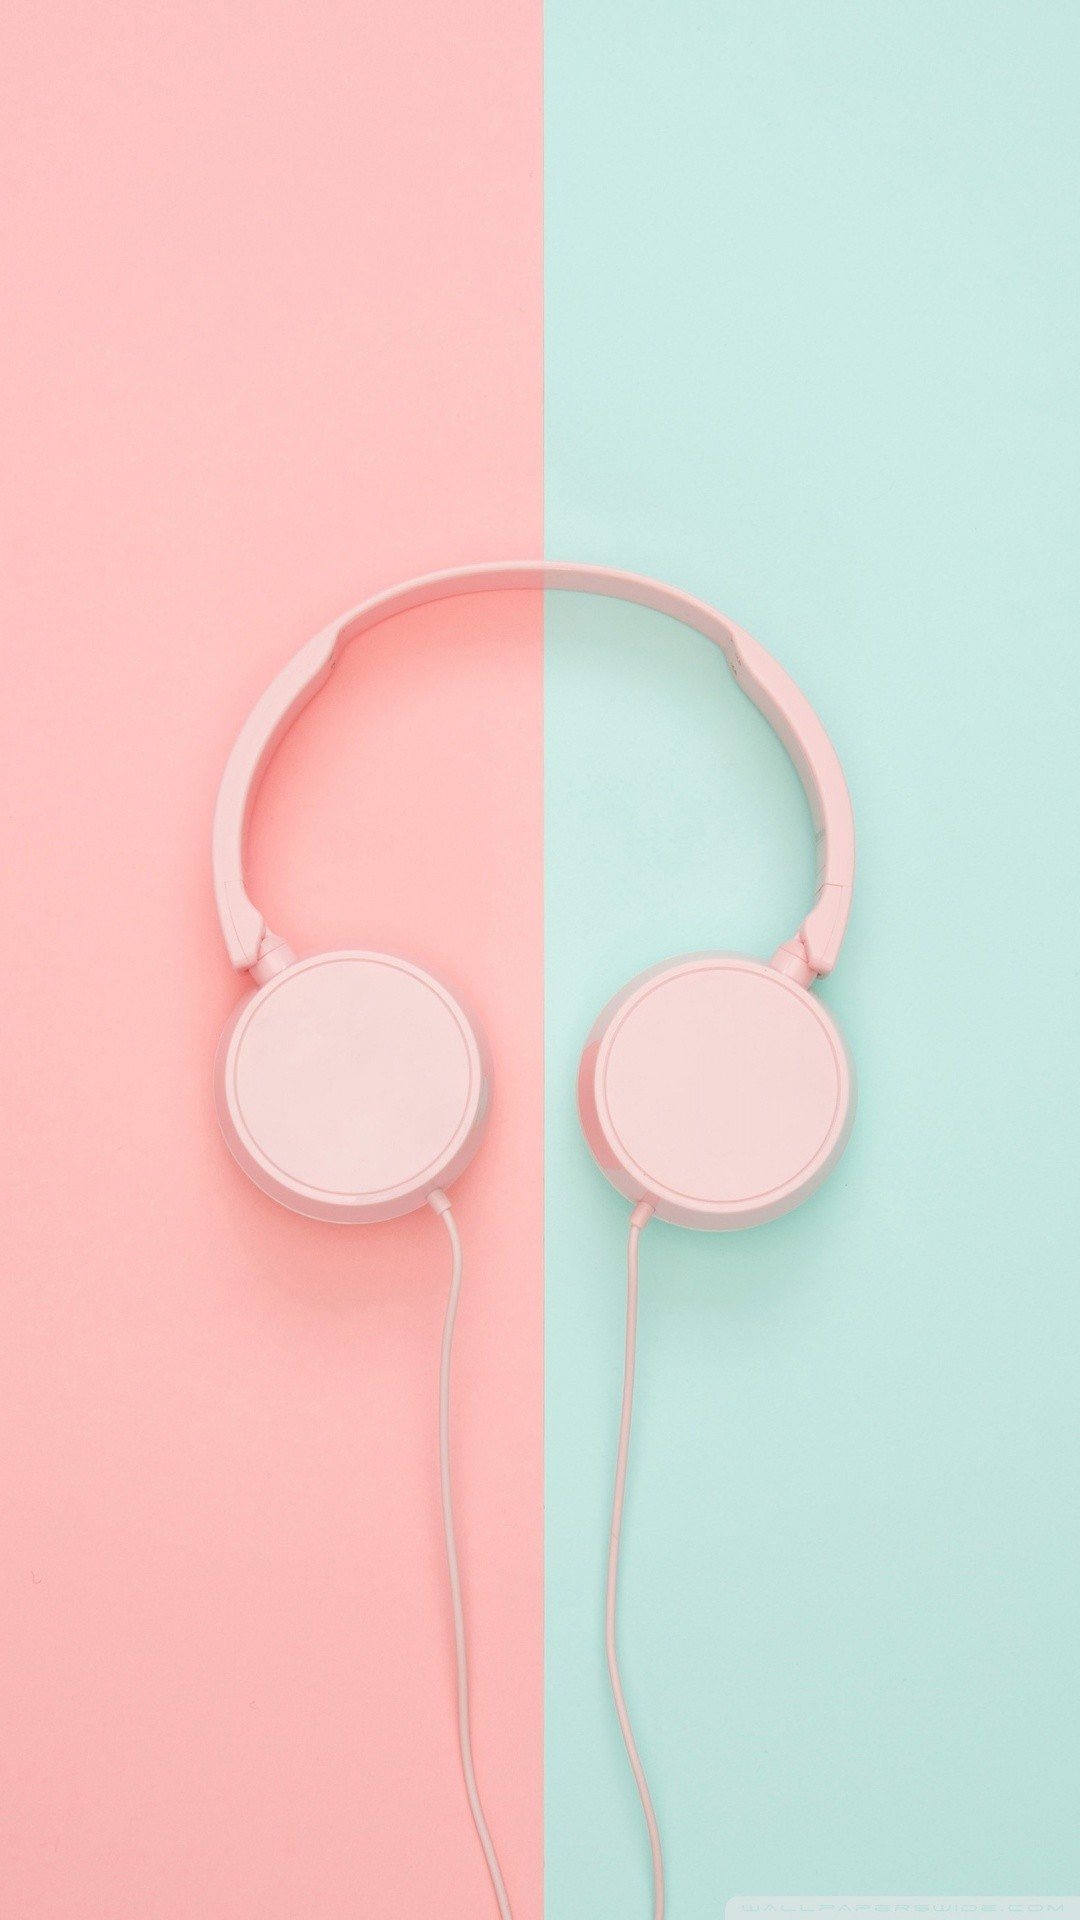 Free Headphones phone wallpaper by queenb0319